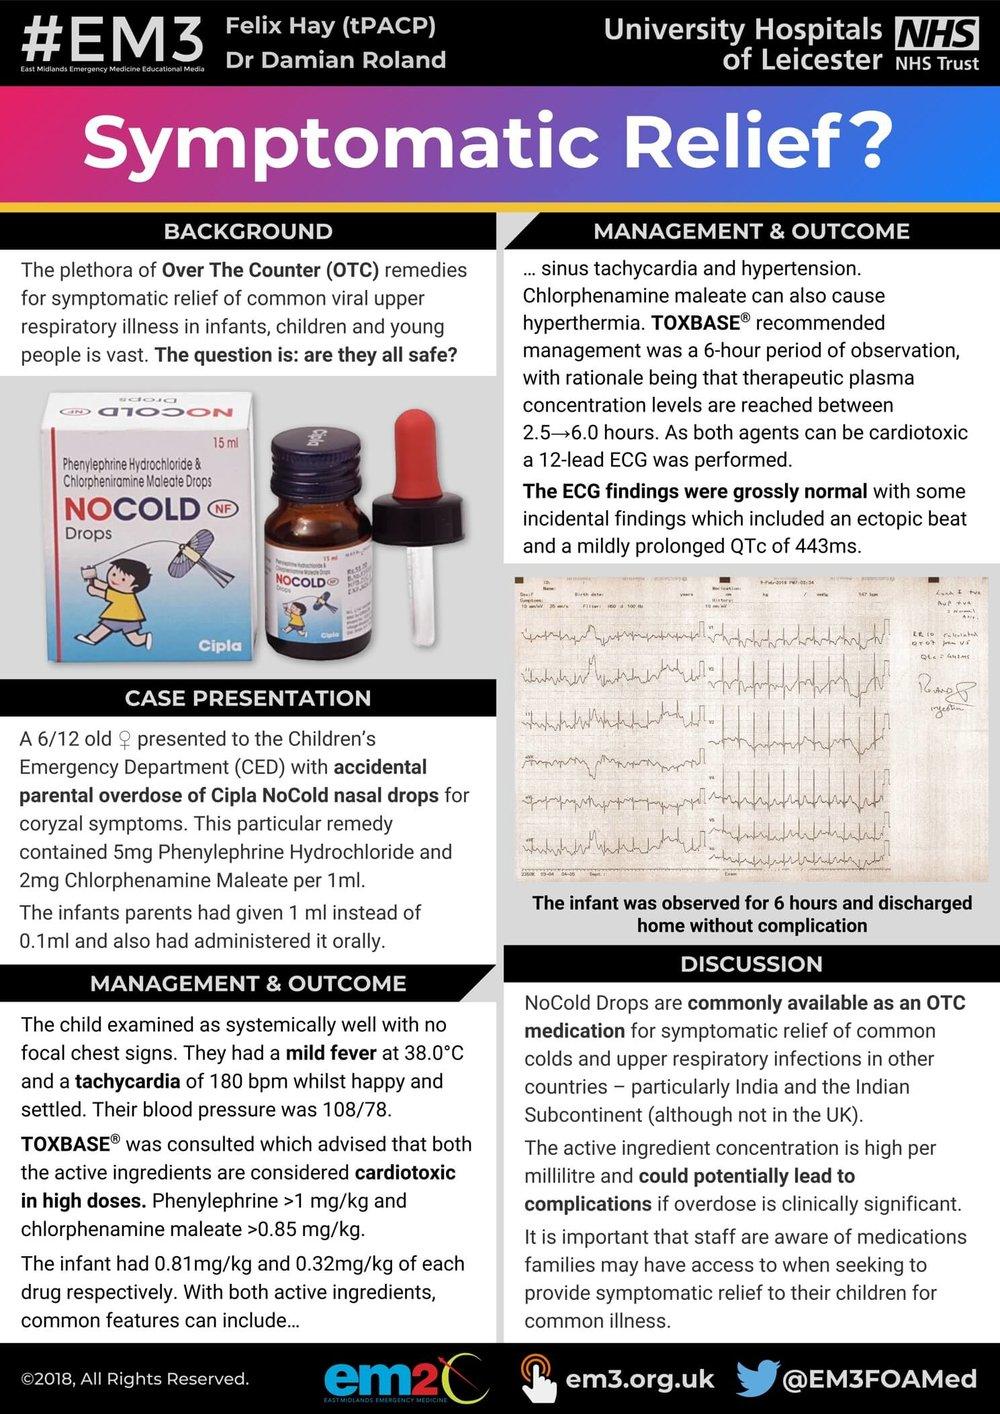 Symptomatic Relief - EM2C poster (Felix Hay).jpg